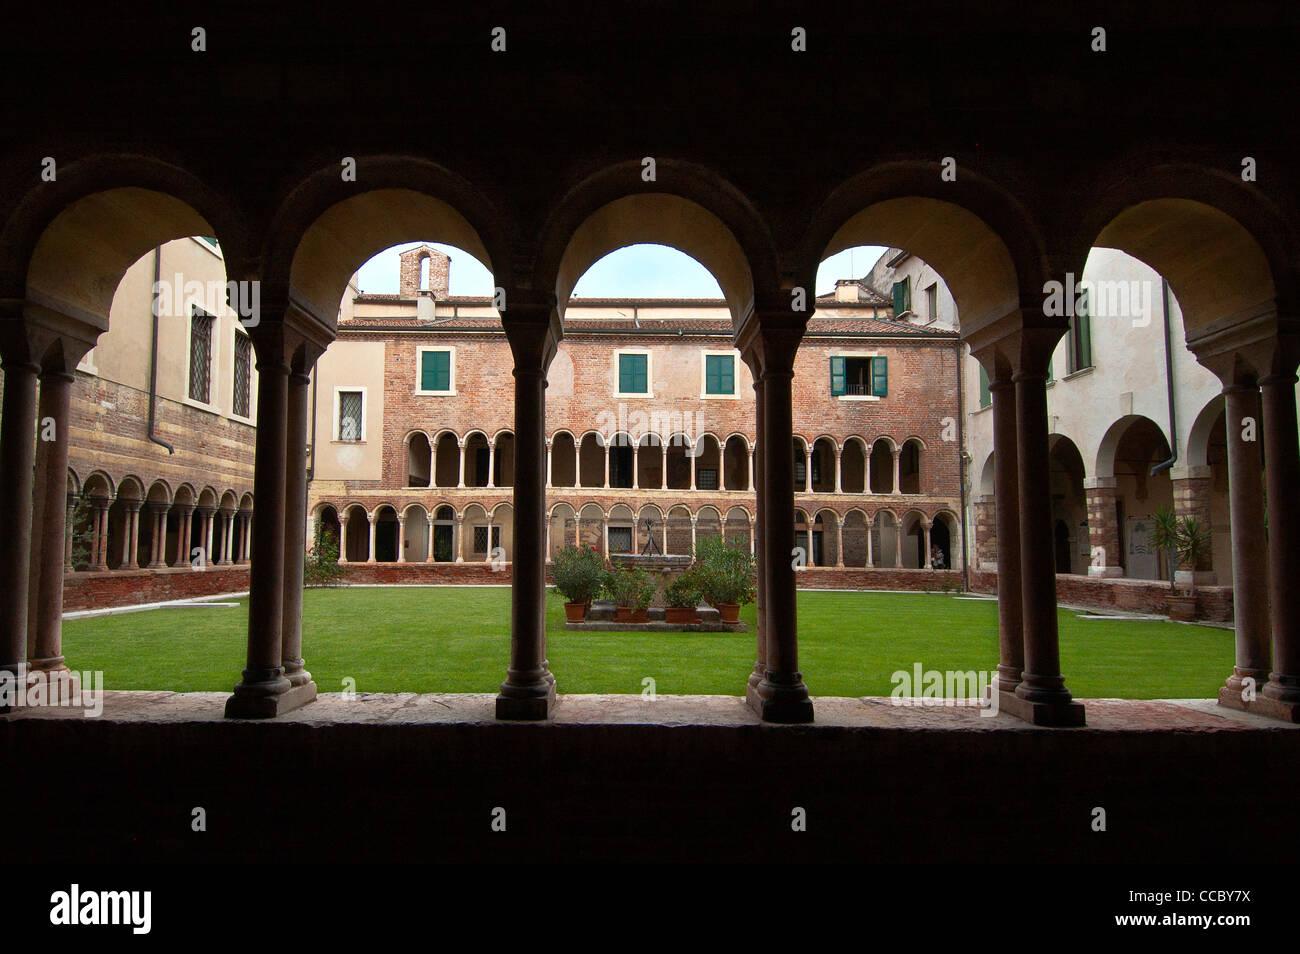 Canonical Museum, Verona, Veneto, Italy - Stock Image